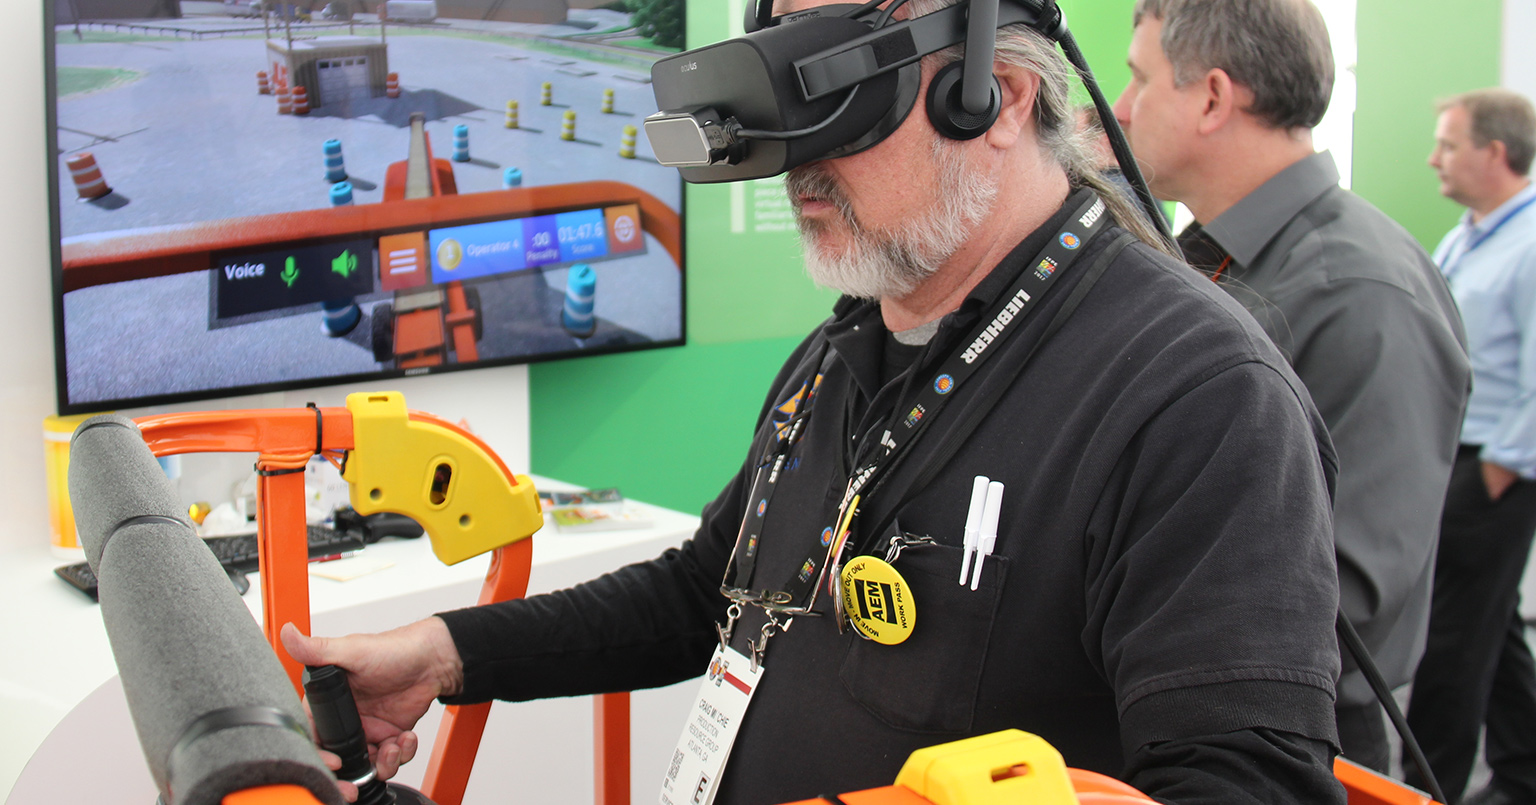 ForgeFX Simulations VR Training Simulator